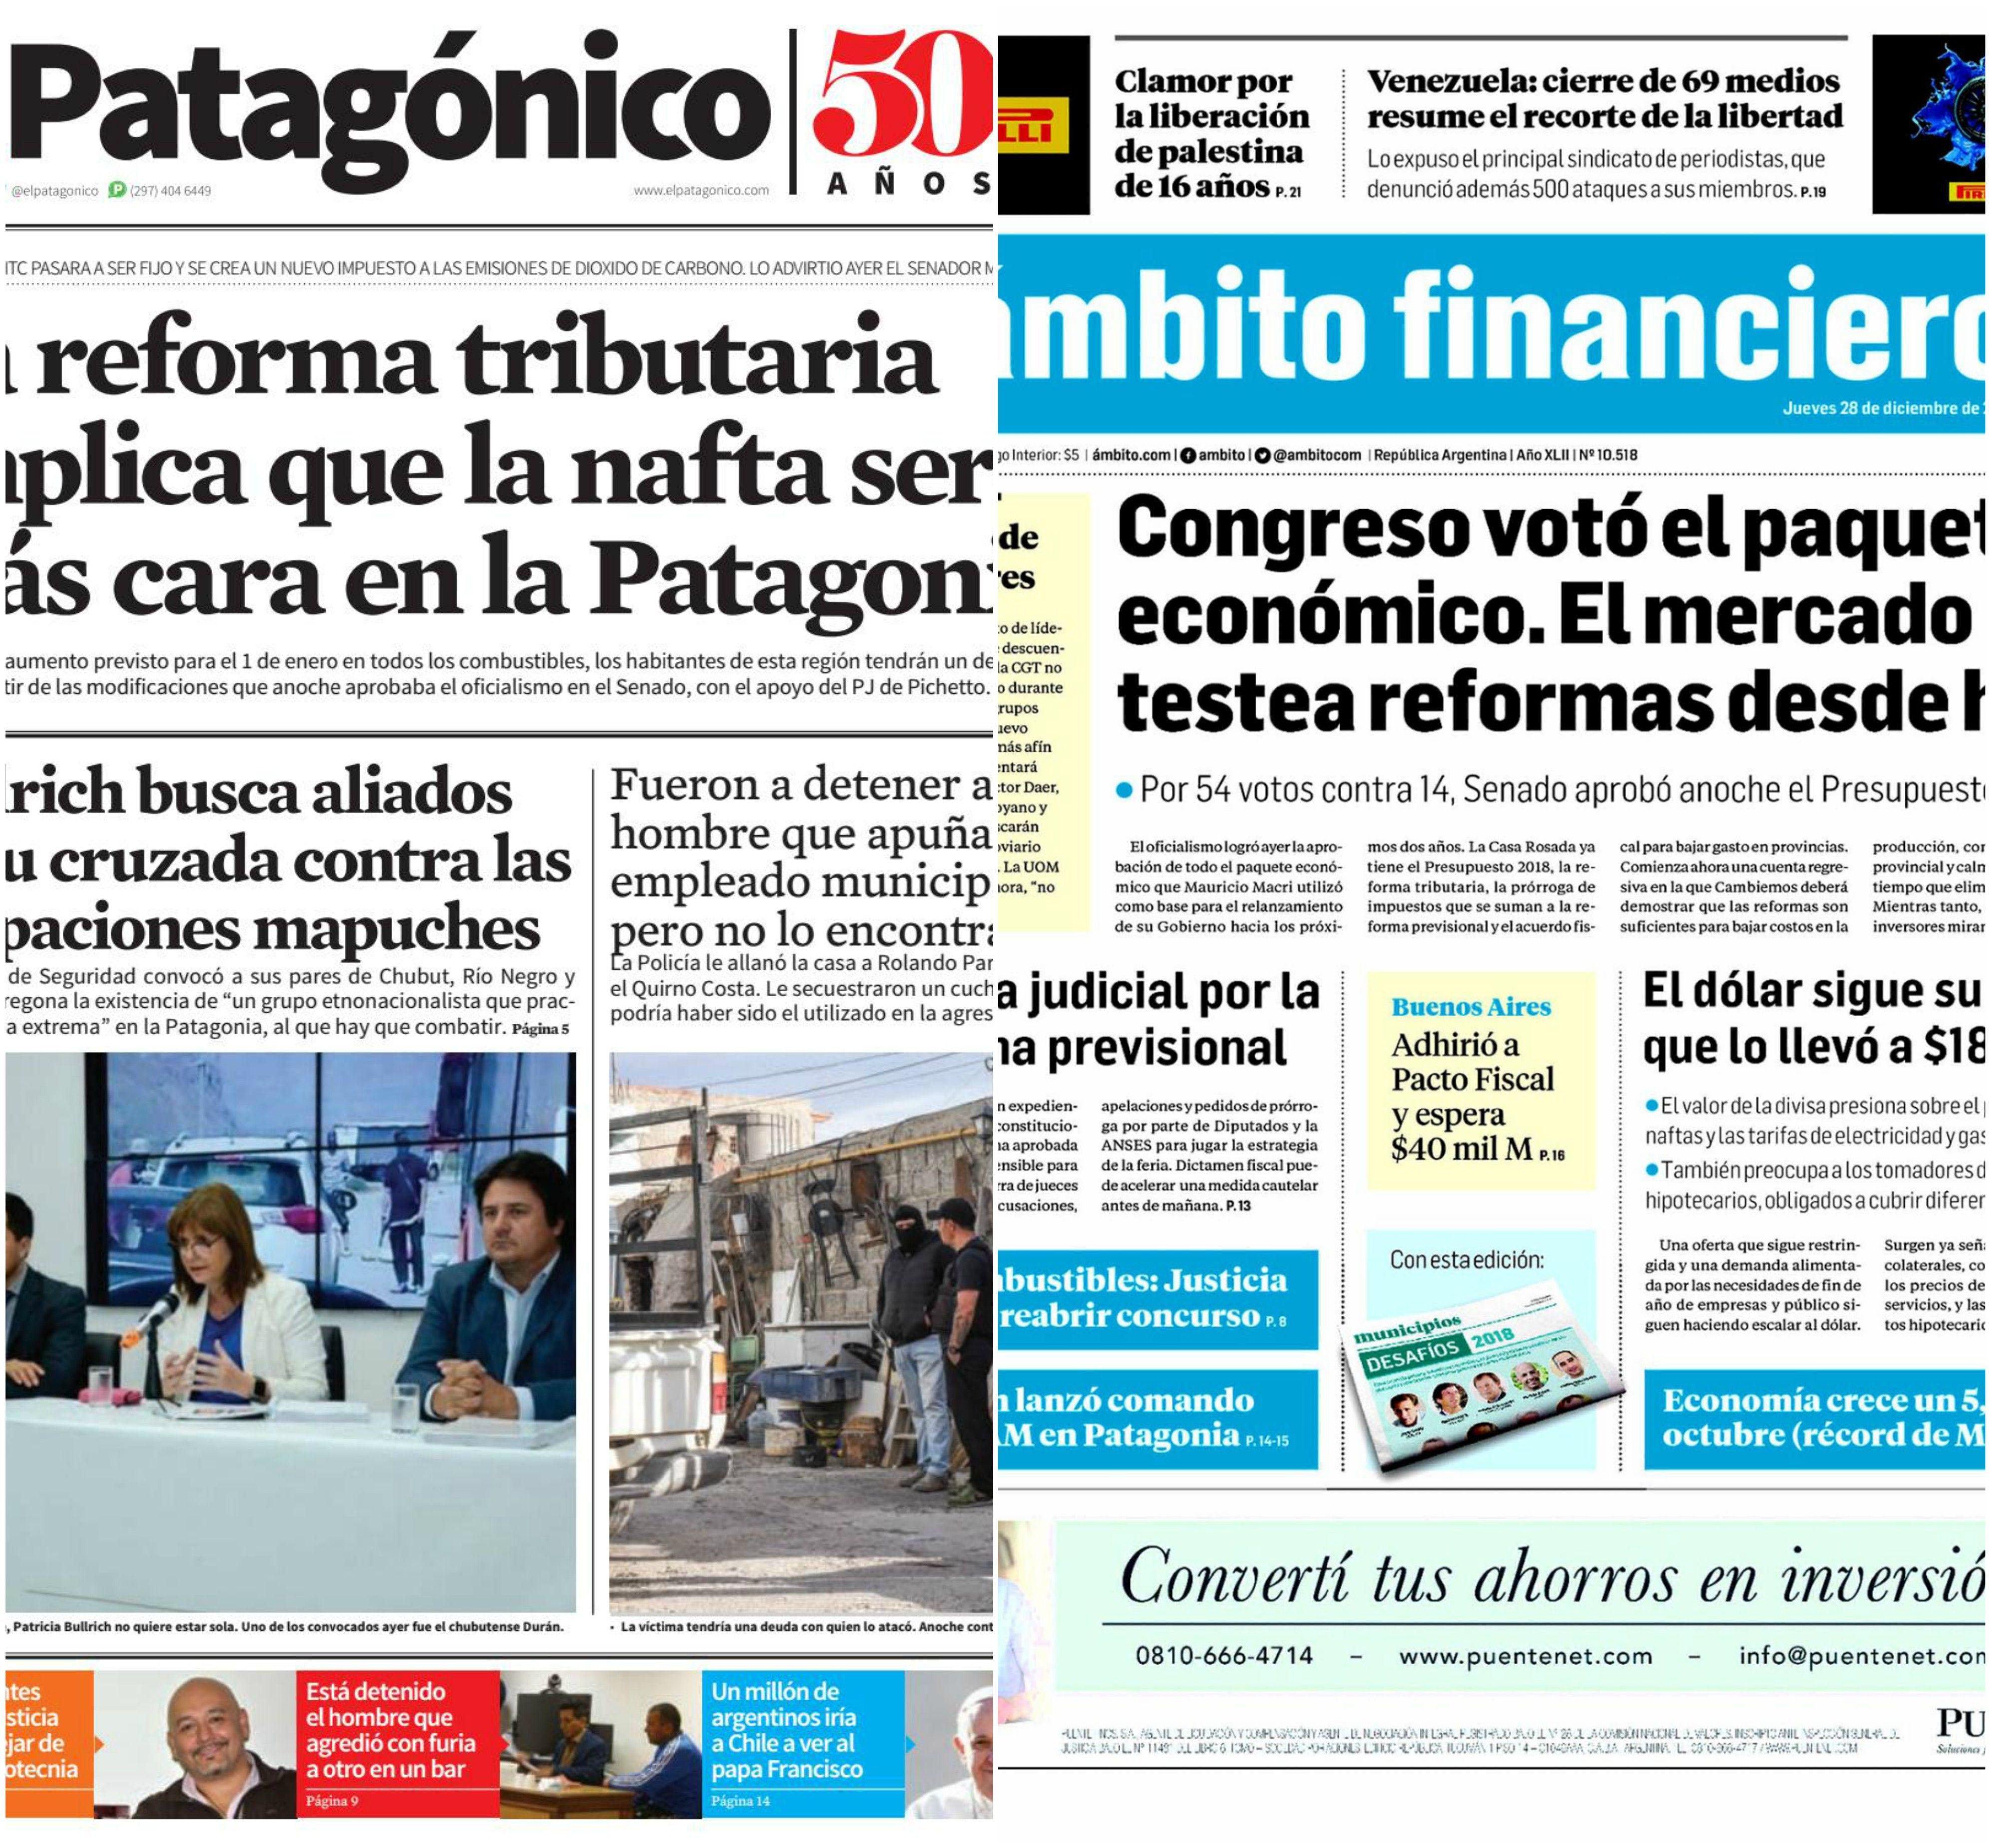 Tapas de diarios del jueves 28 de diciembre de 2017